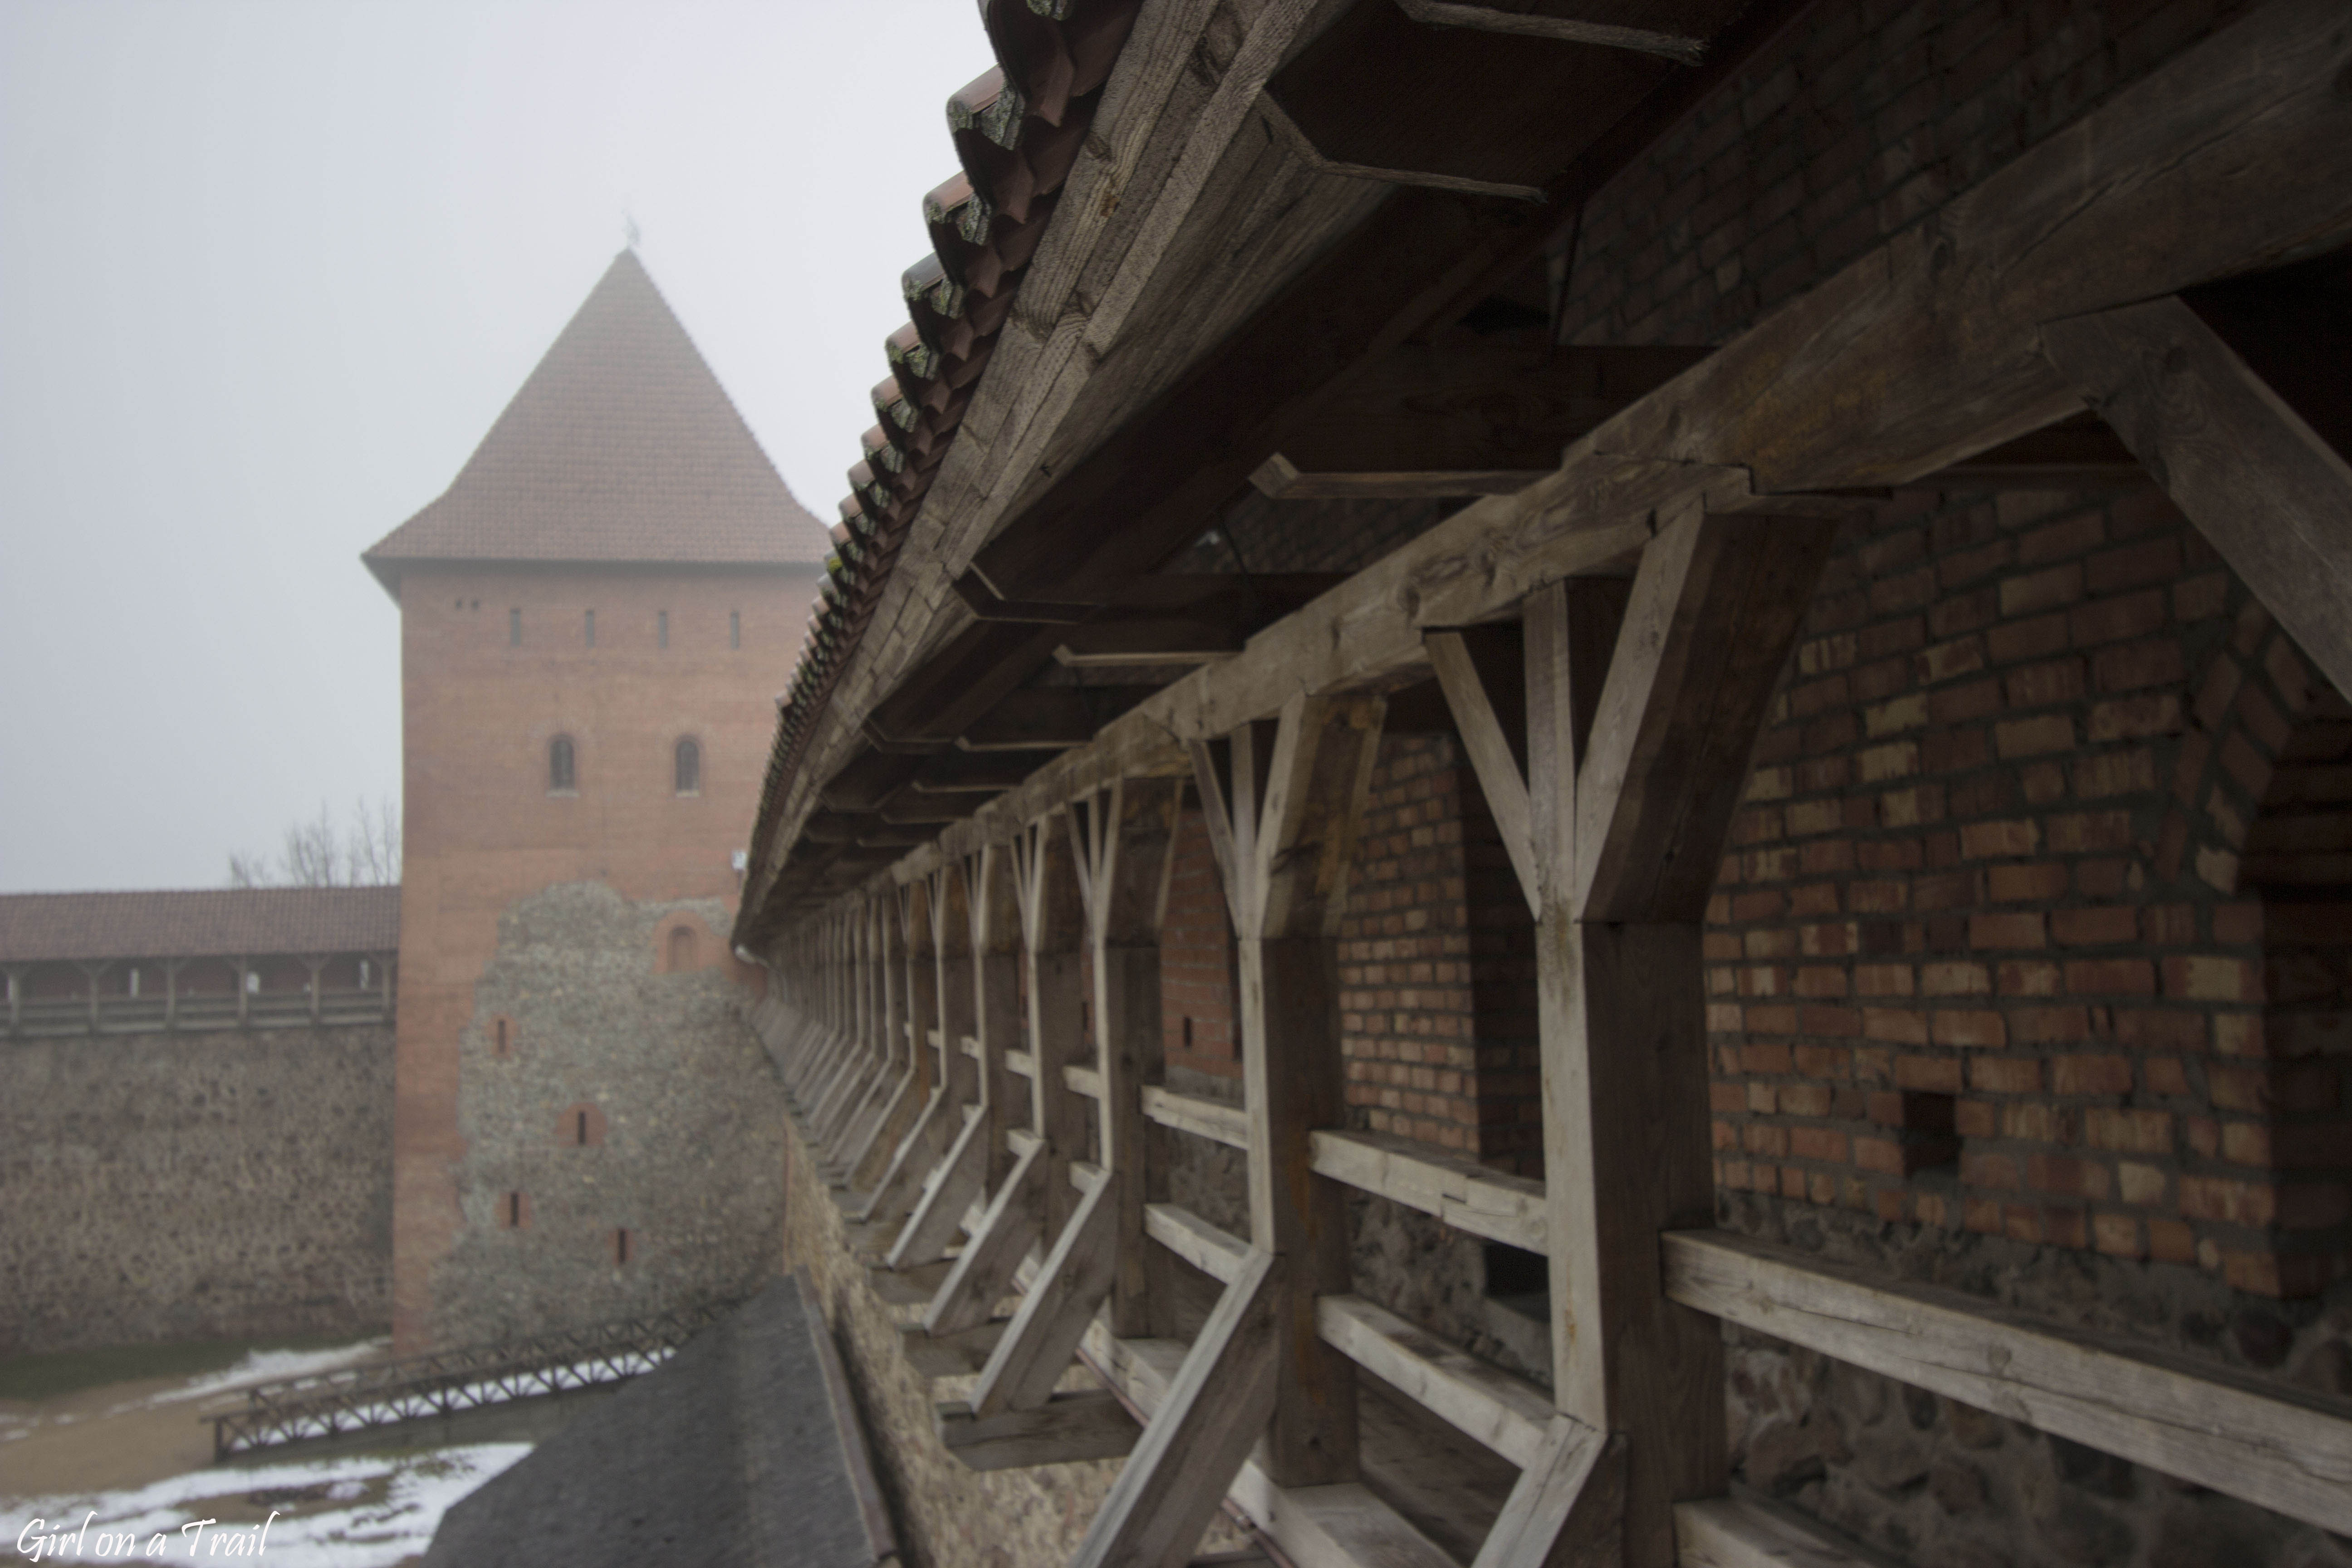 Białoruś - Lida, Zamek